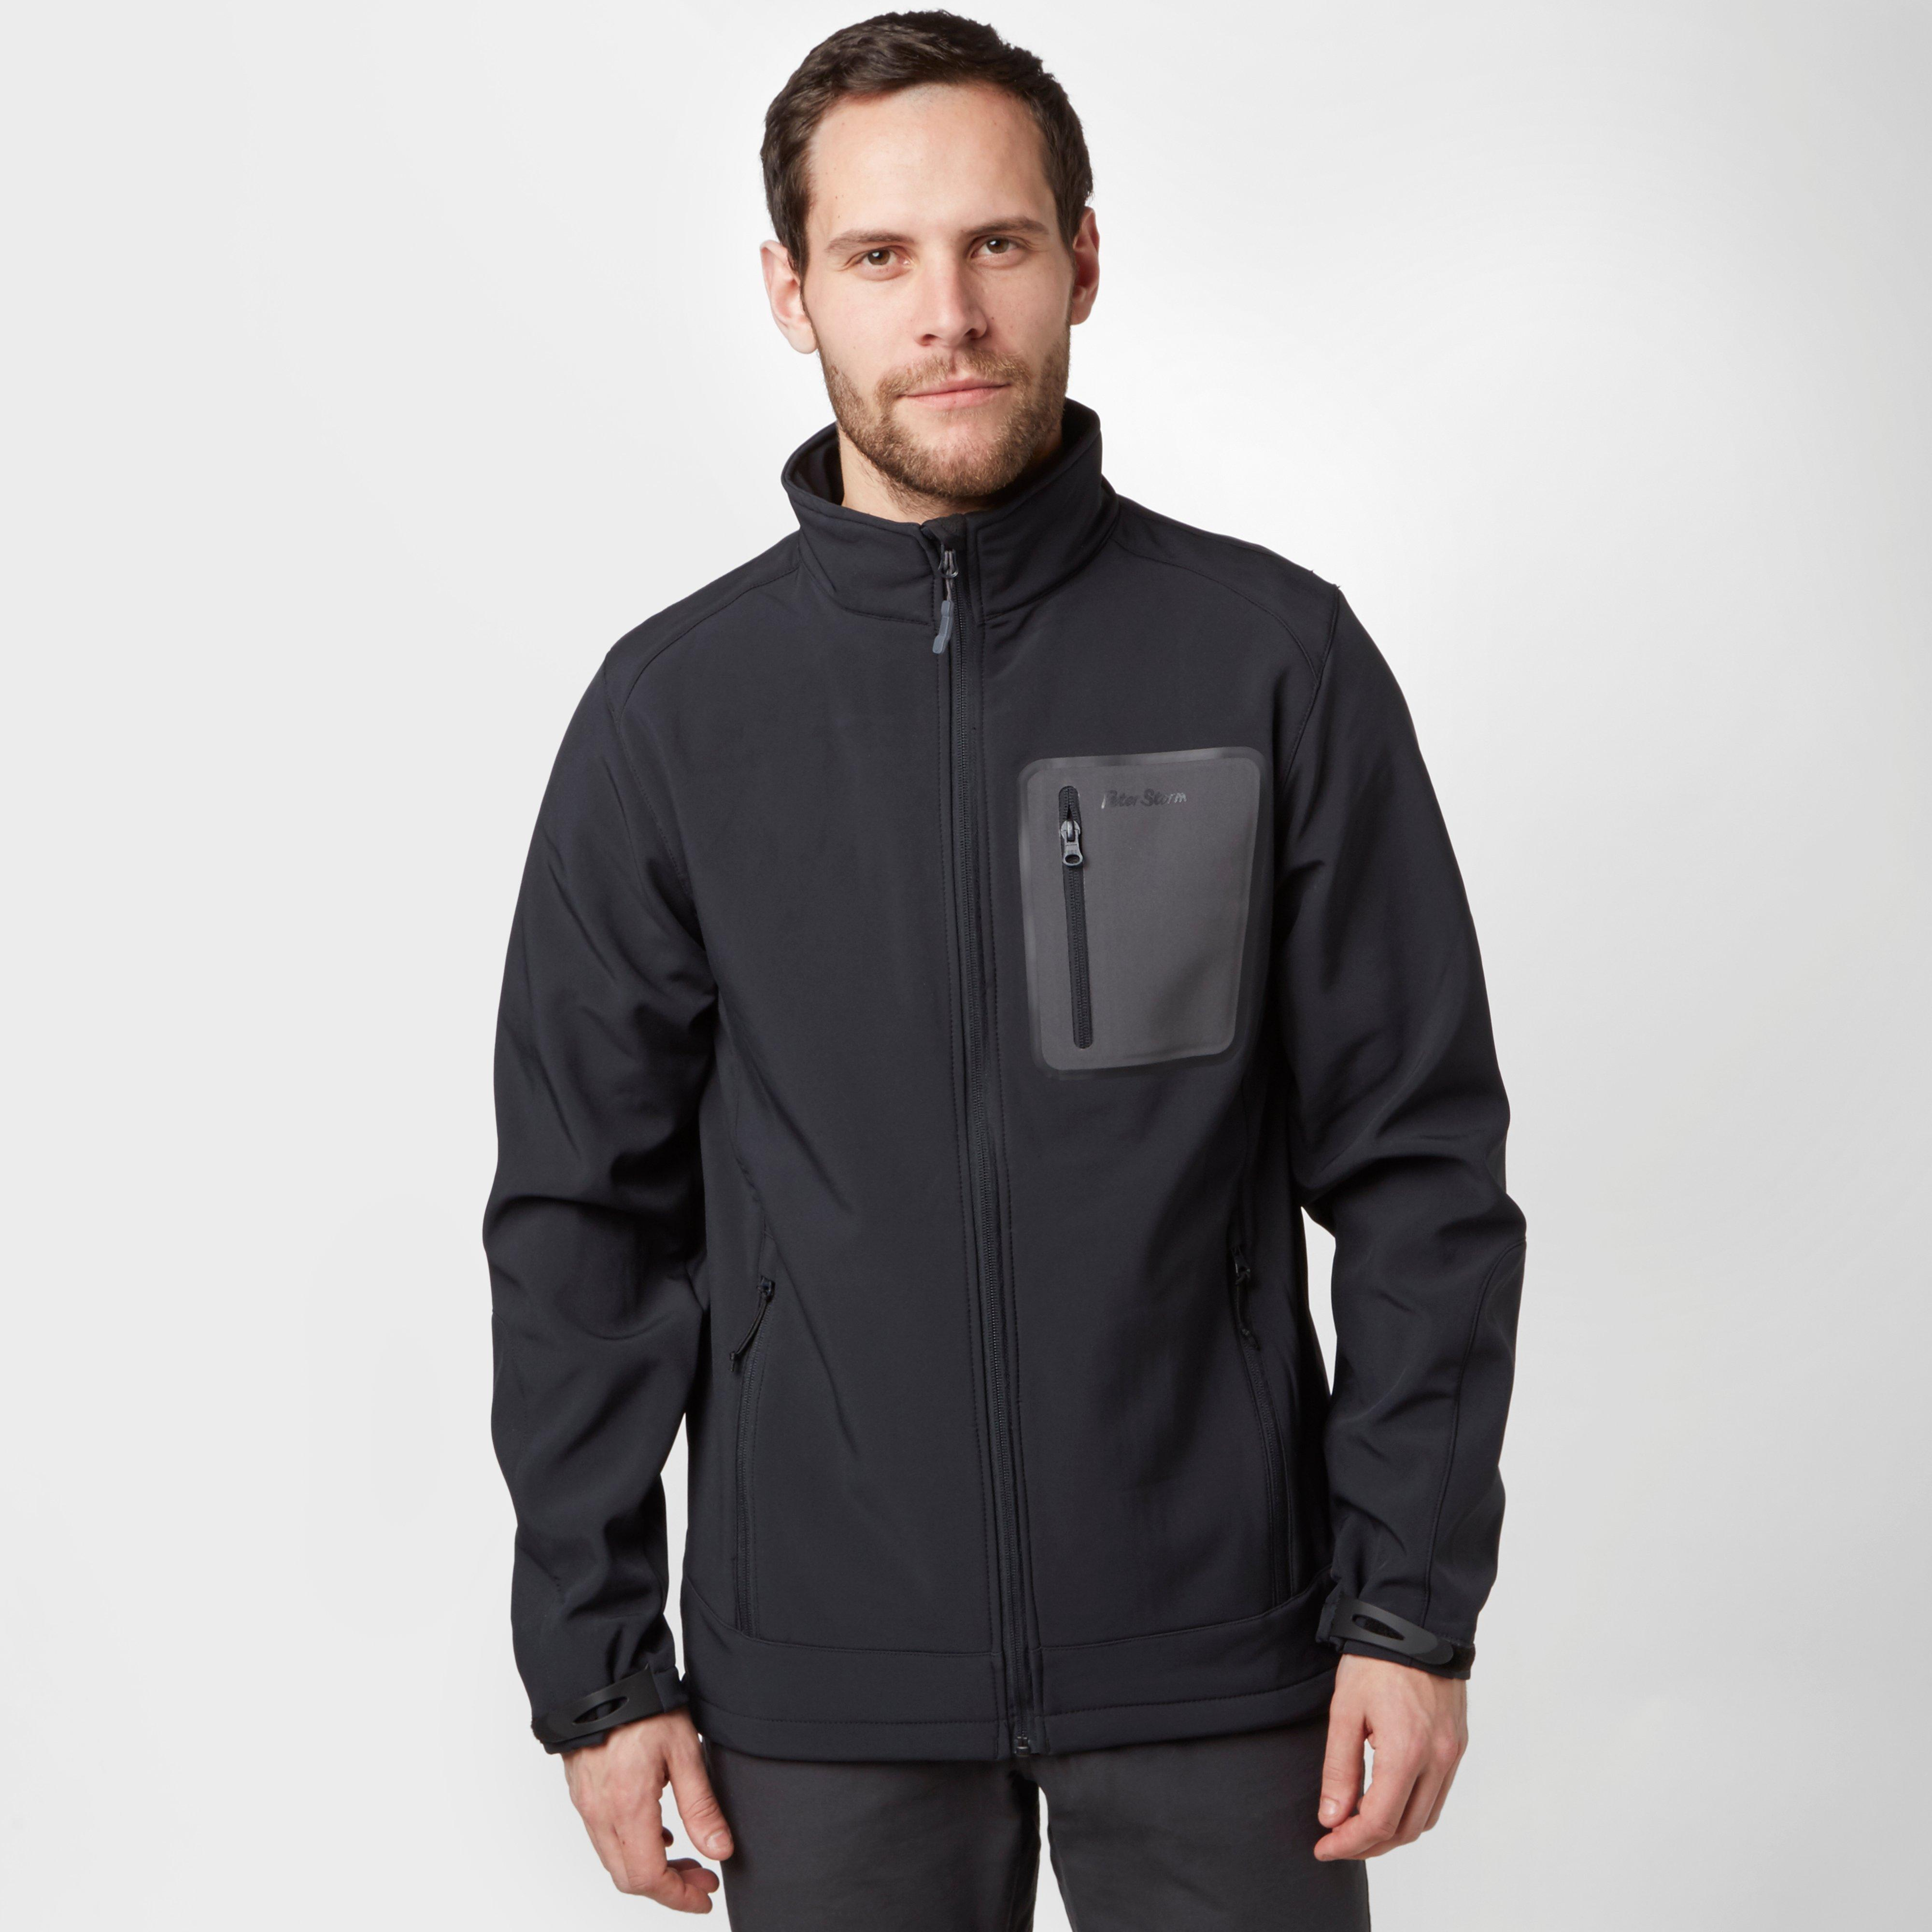 Peter Storm Men's Bonded Softshell Jacket, Black